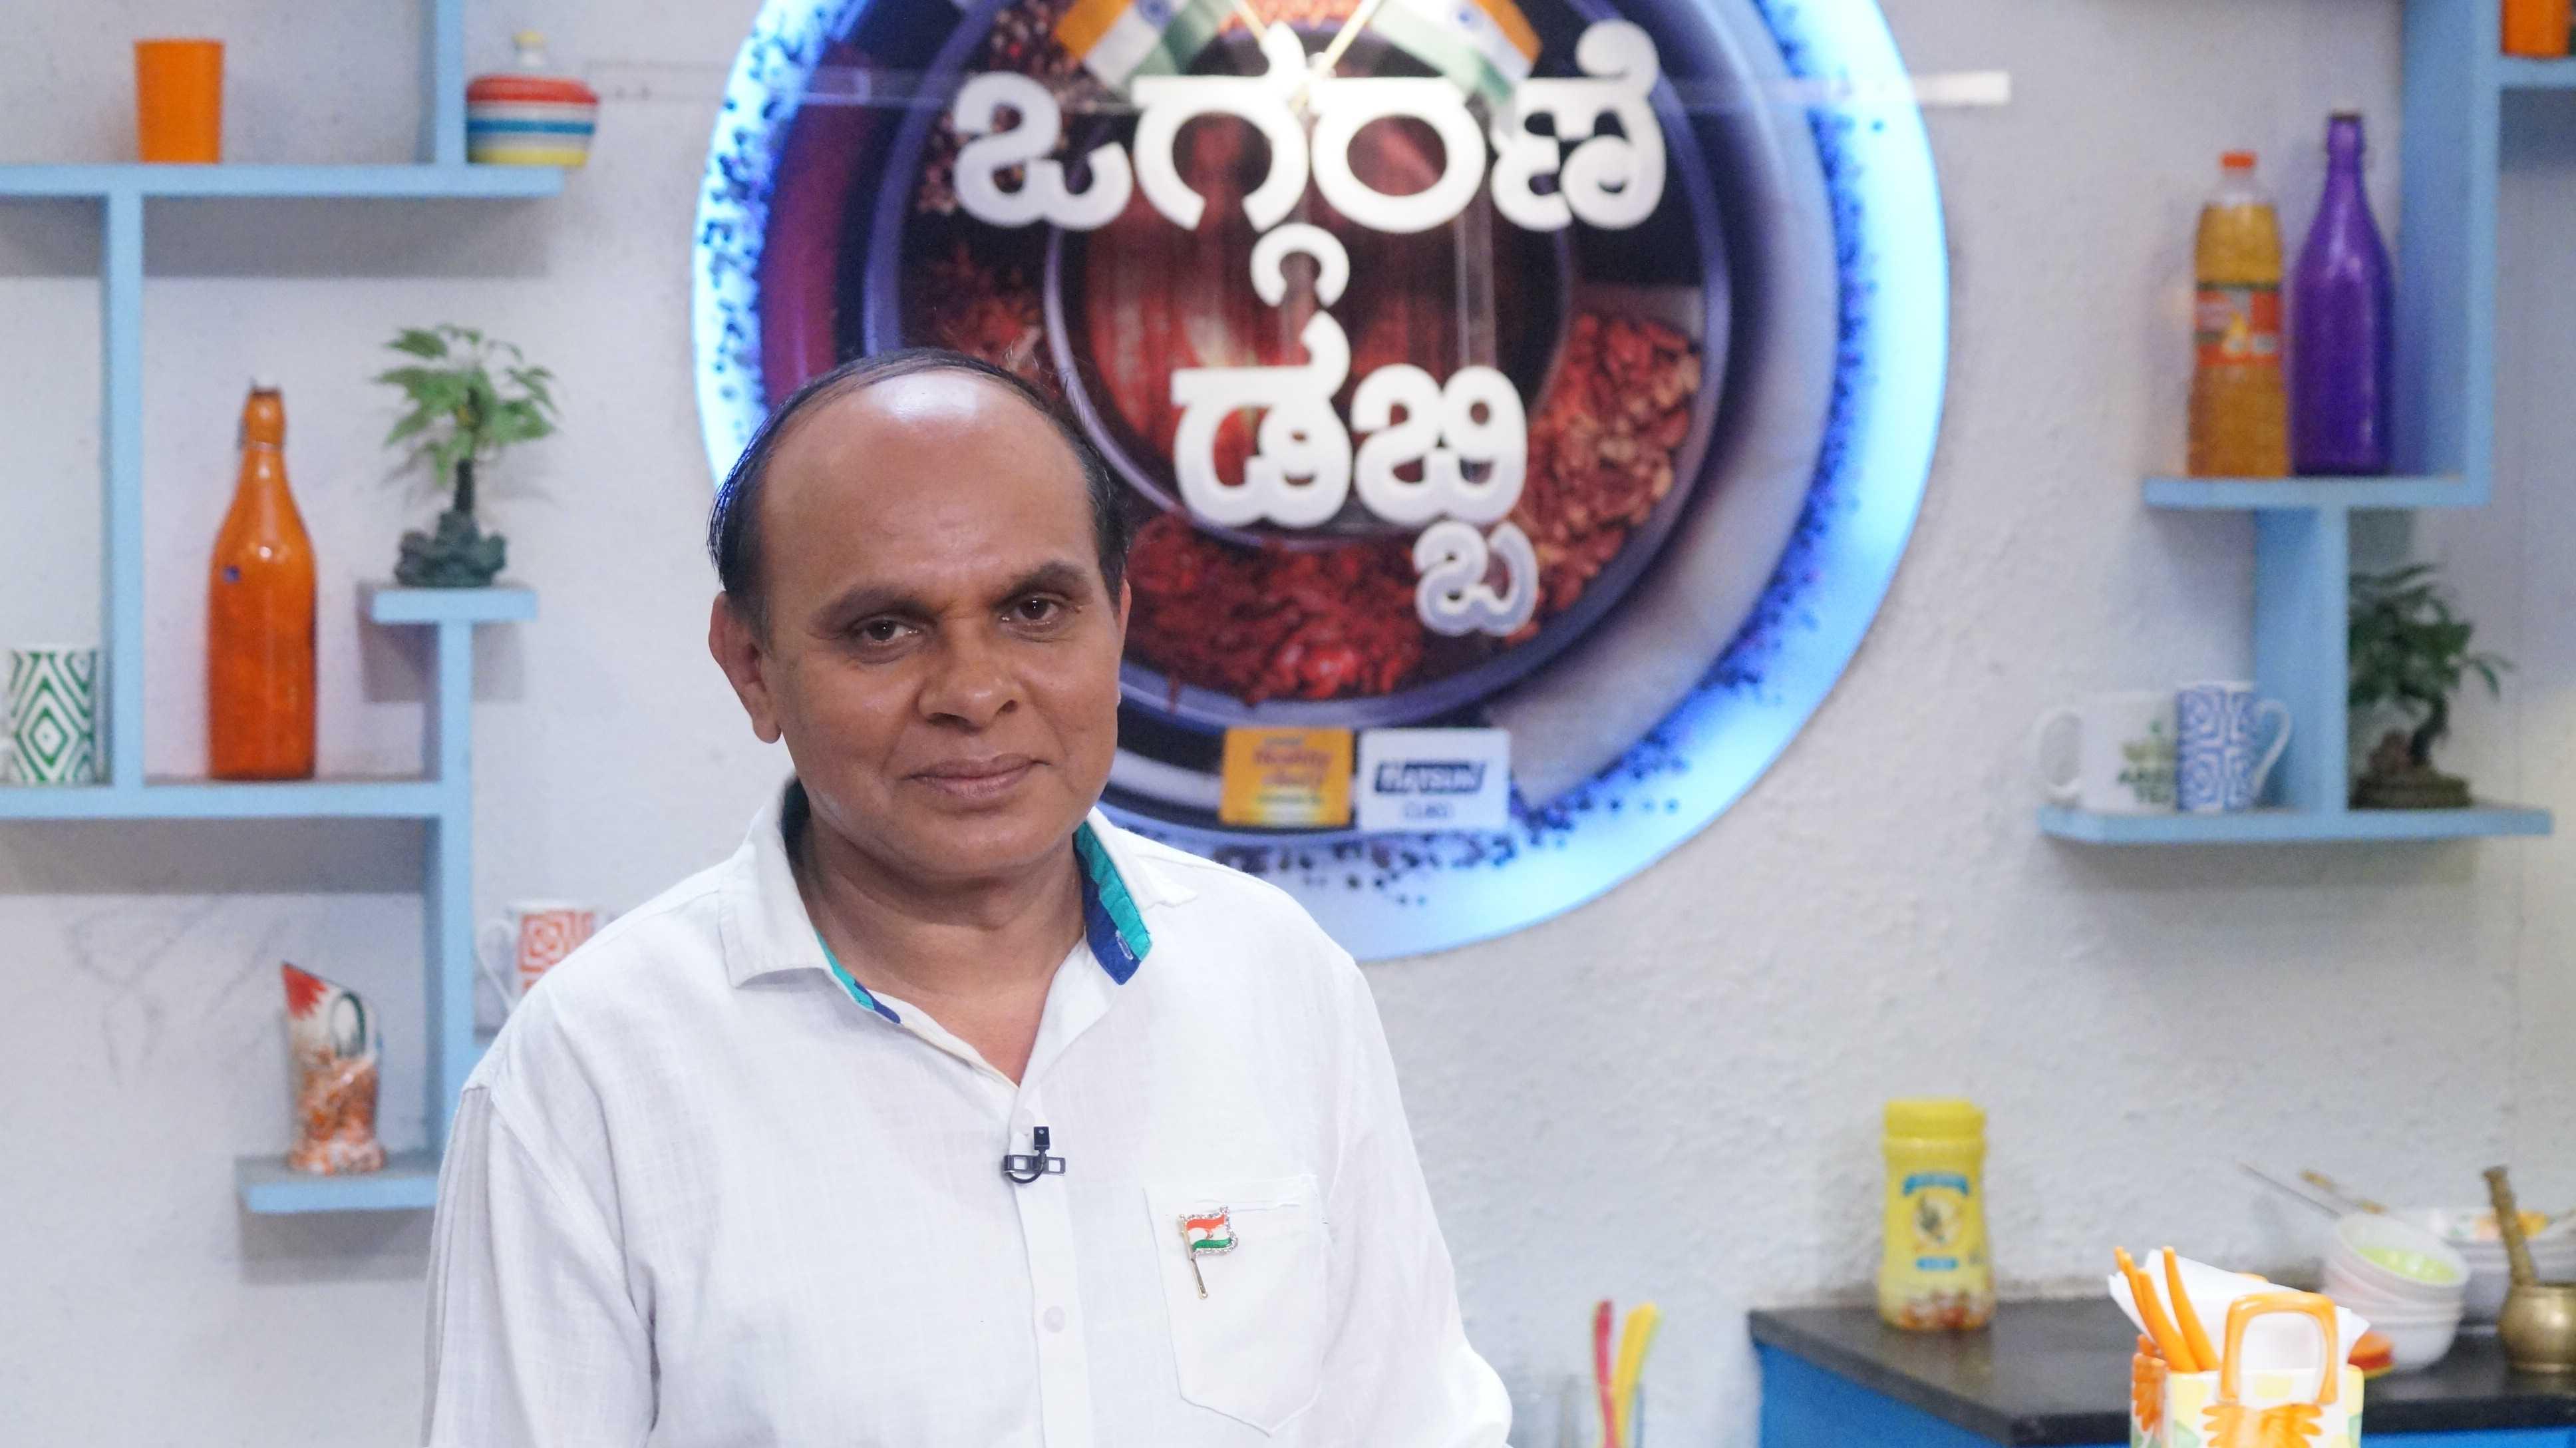 Prakash Raos Cooks & Caterers in Banashankari, Bangalore-560070